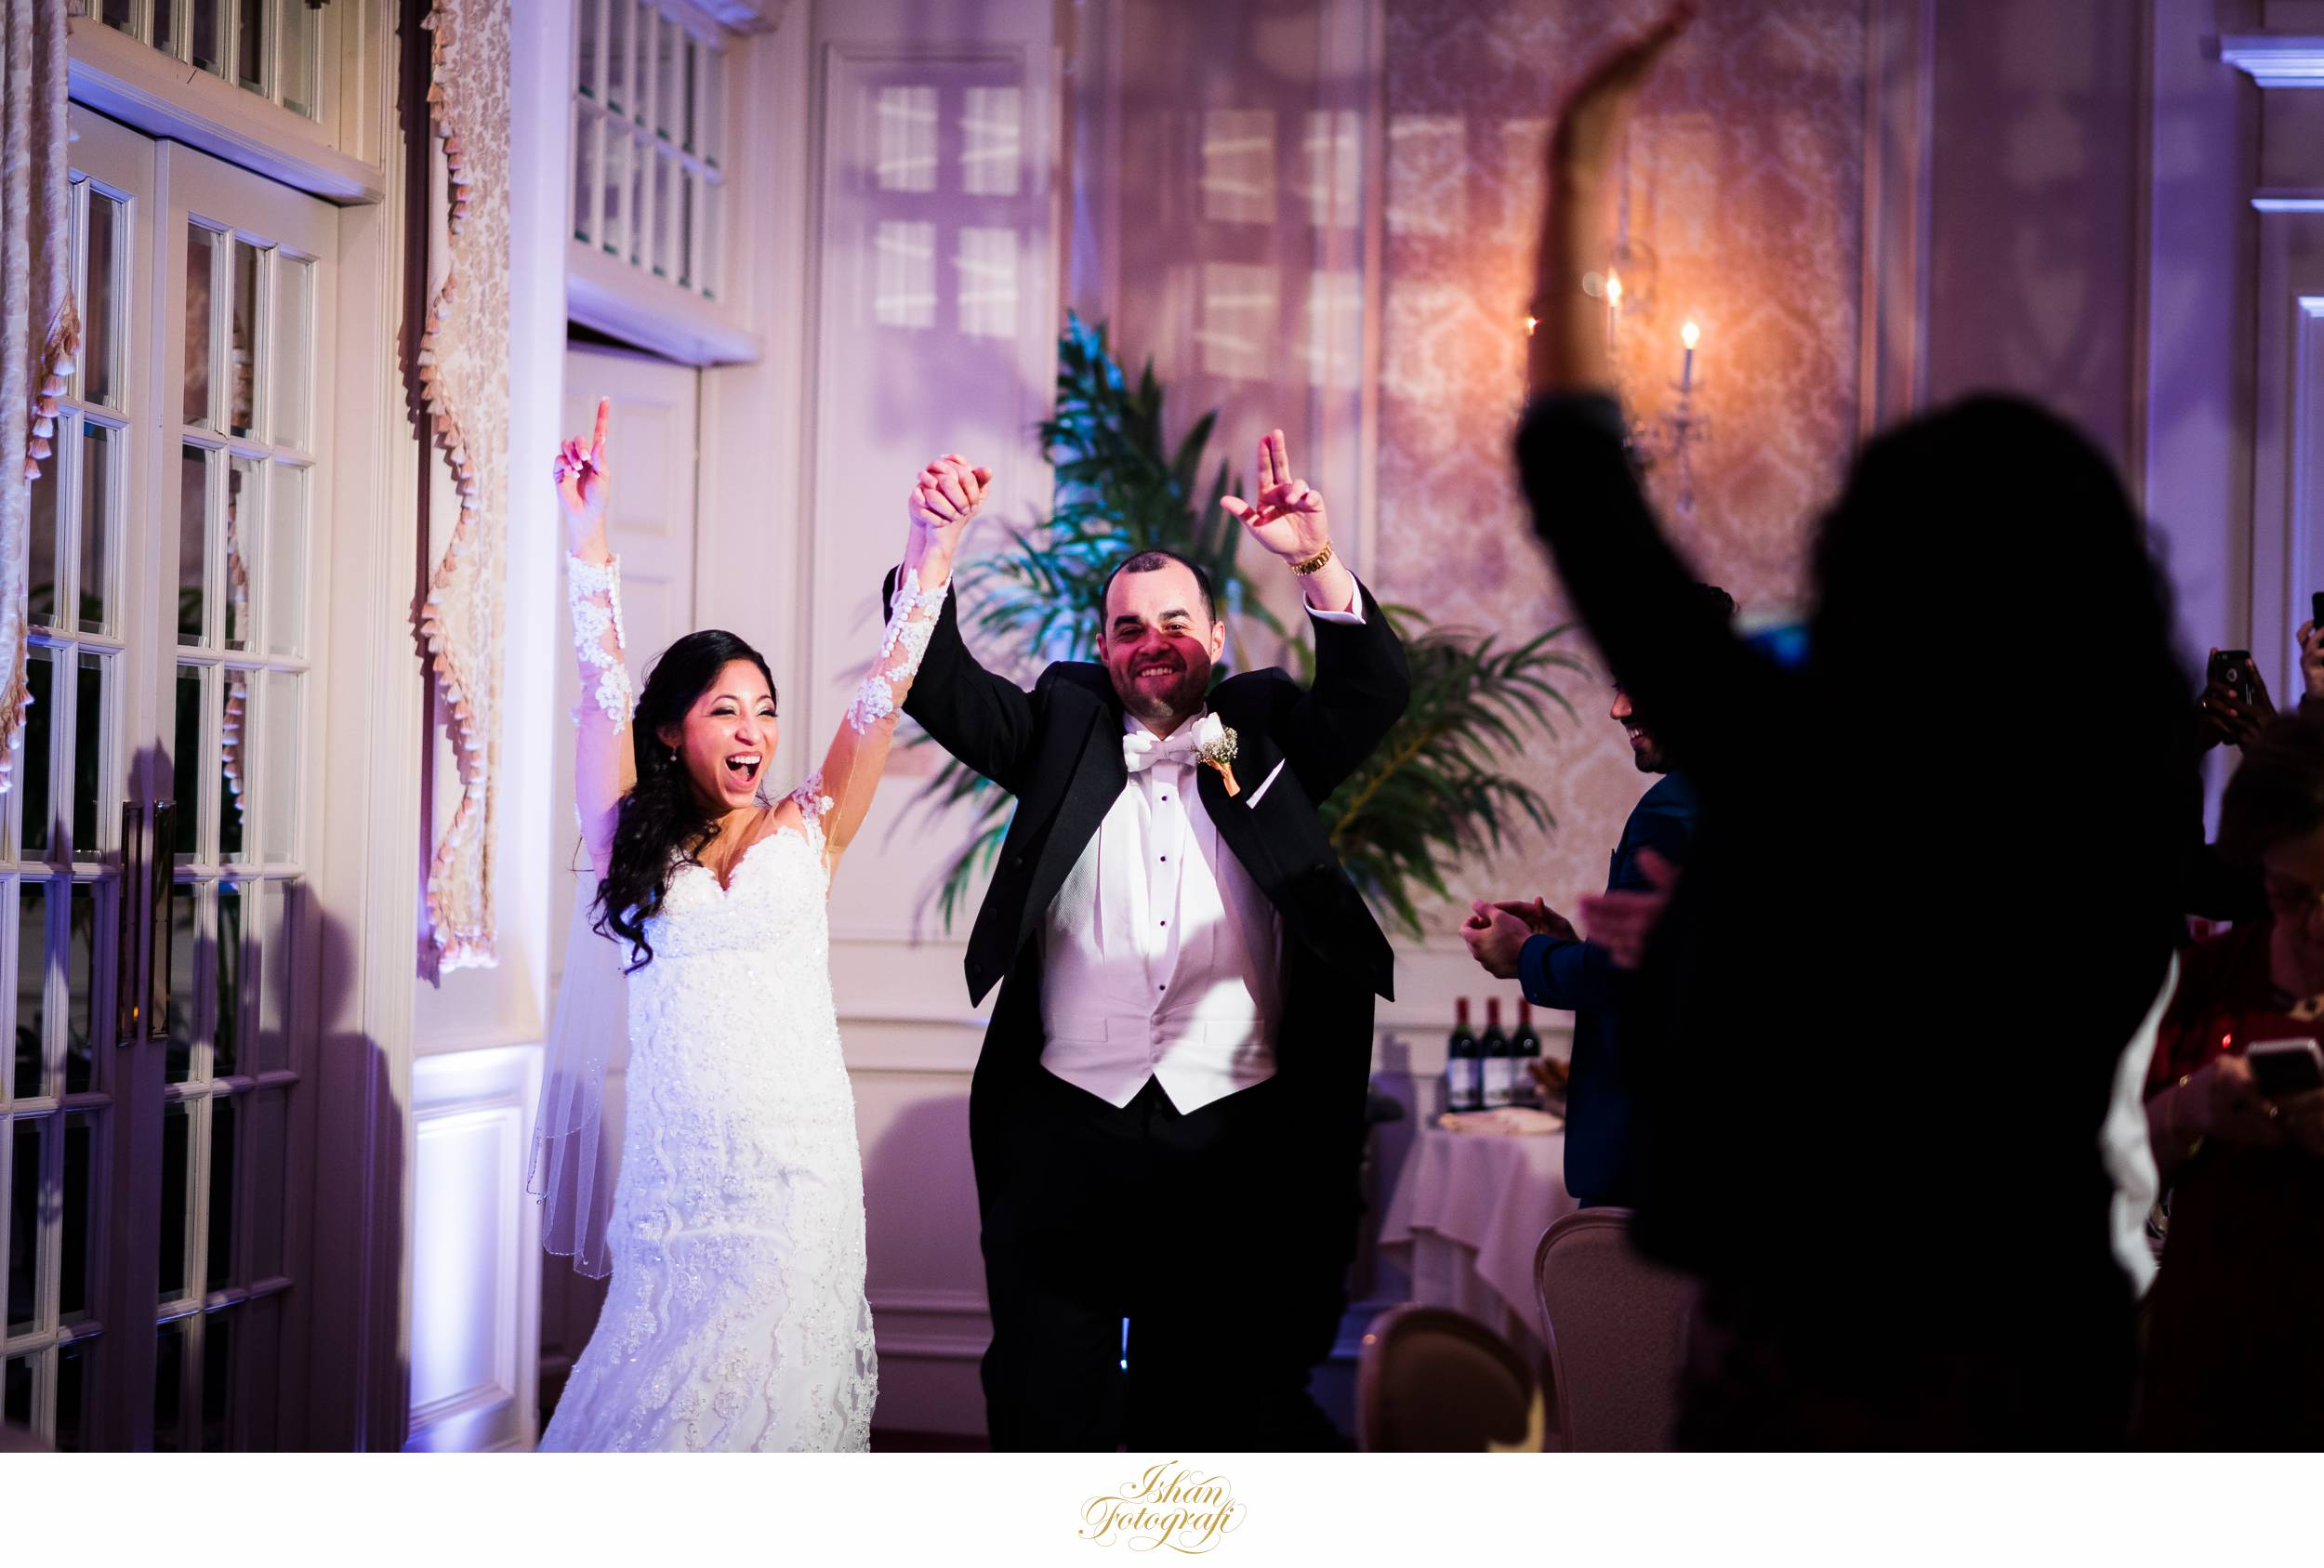 wedding-reception-at-meadow-wood-manor